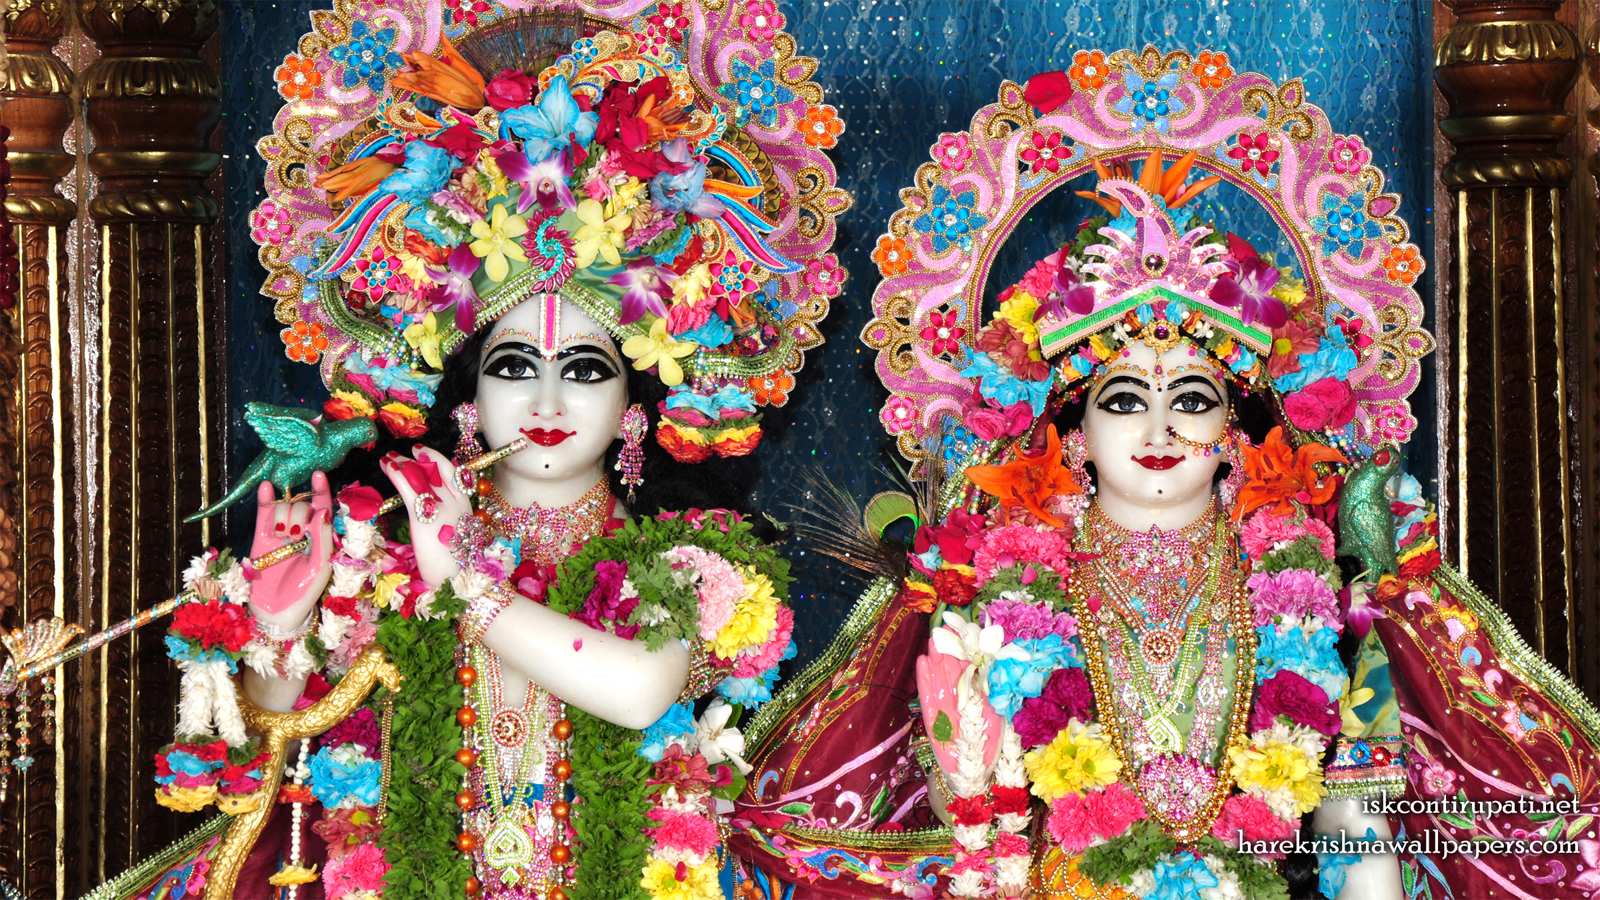 Sri Sri Radha Govinda Close up Wallpaper (002) Size 1600x900 Download